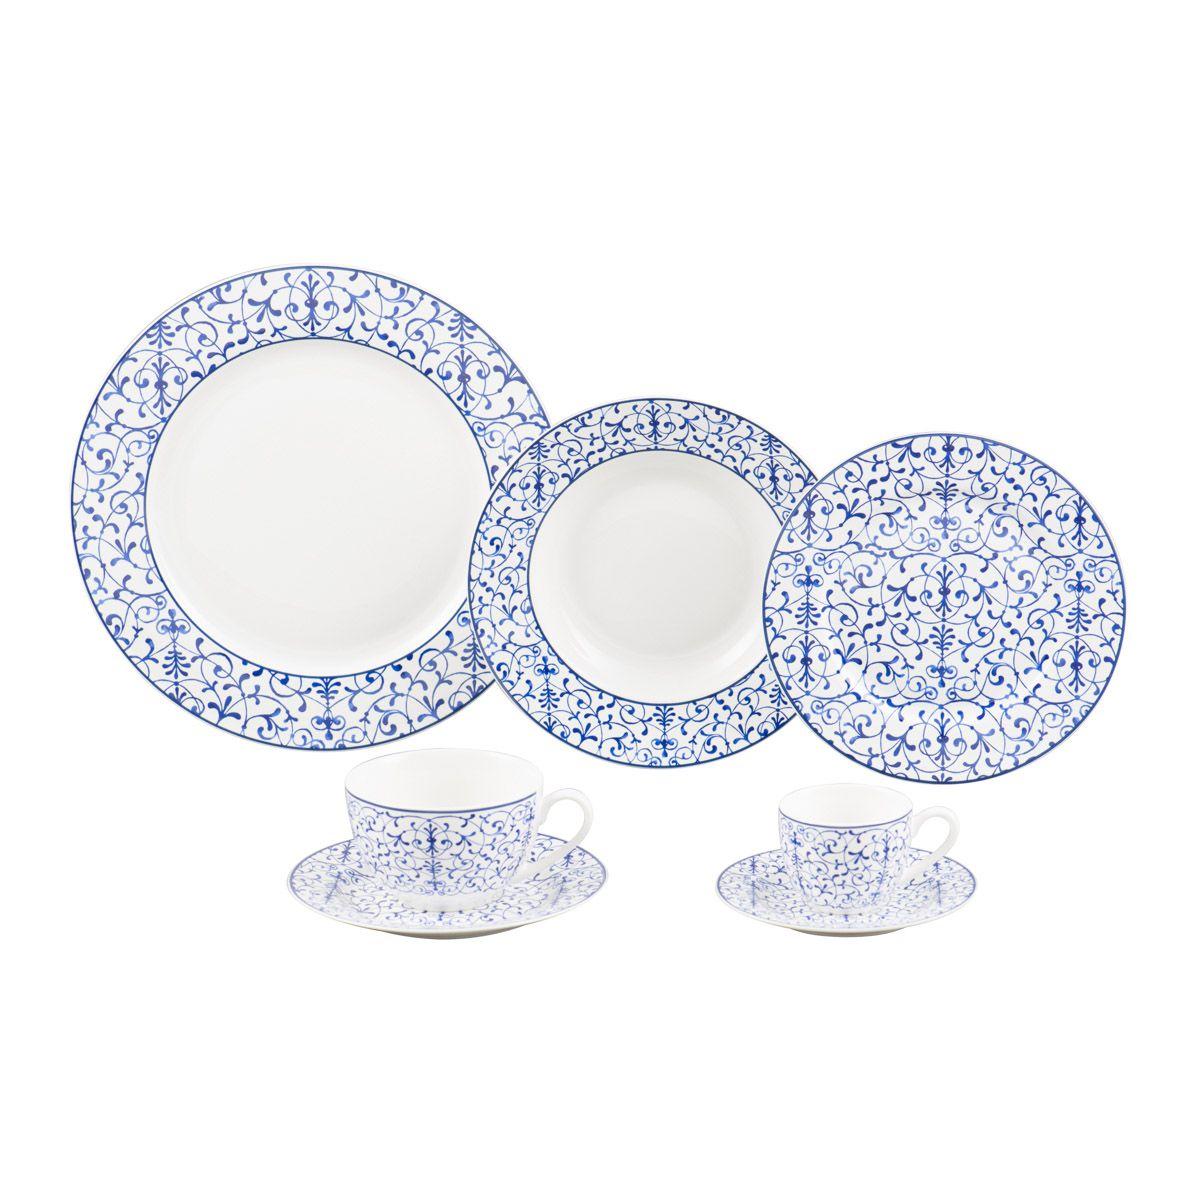 Jogo de Jantar 42pc Porcelana Super White Abstract